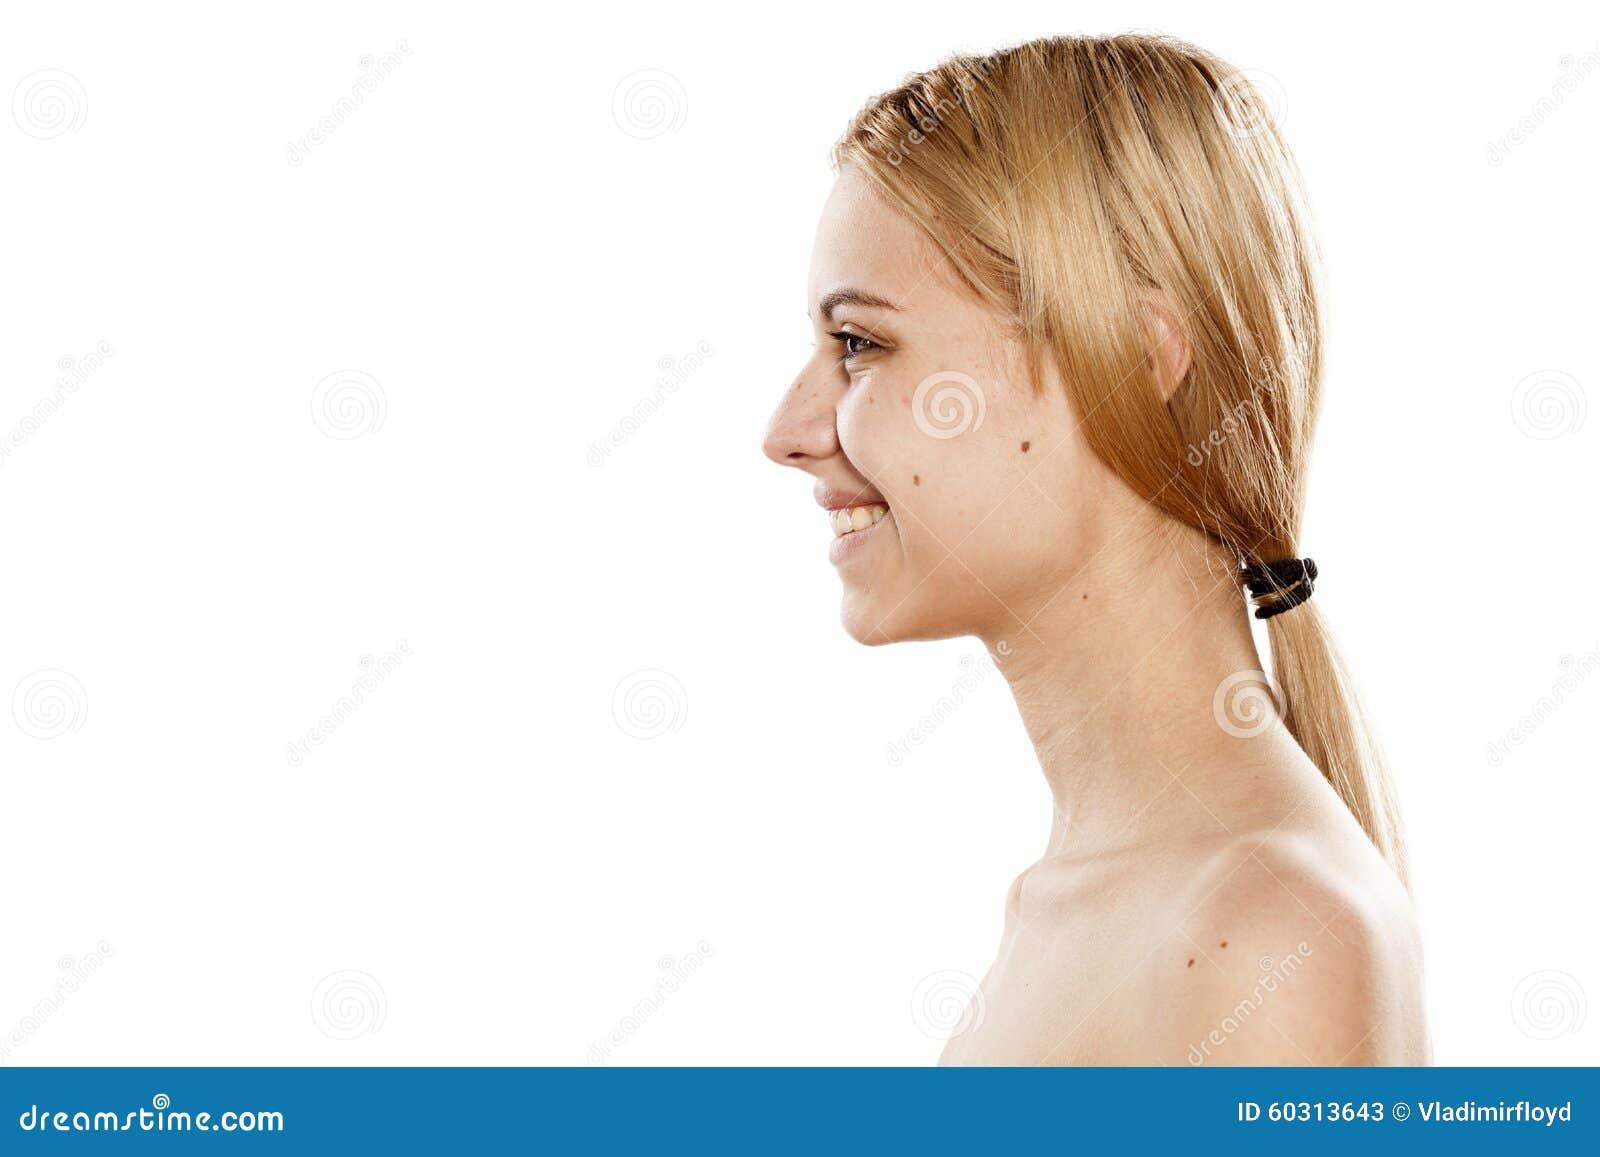 Mujer sonriente sin maquillaje